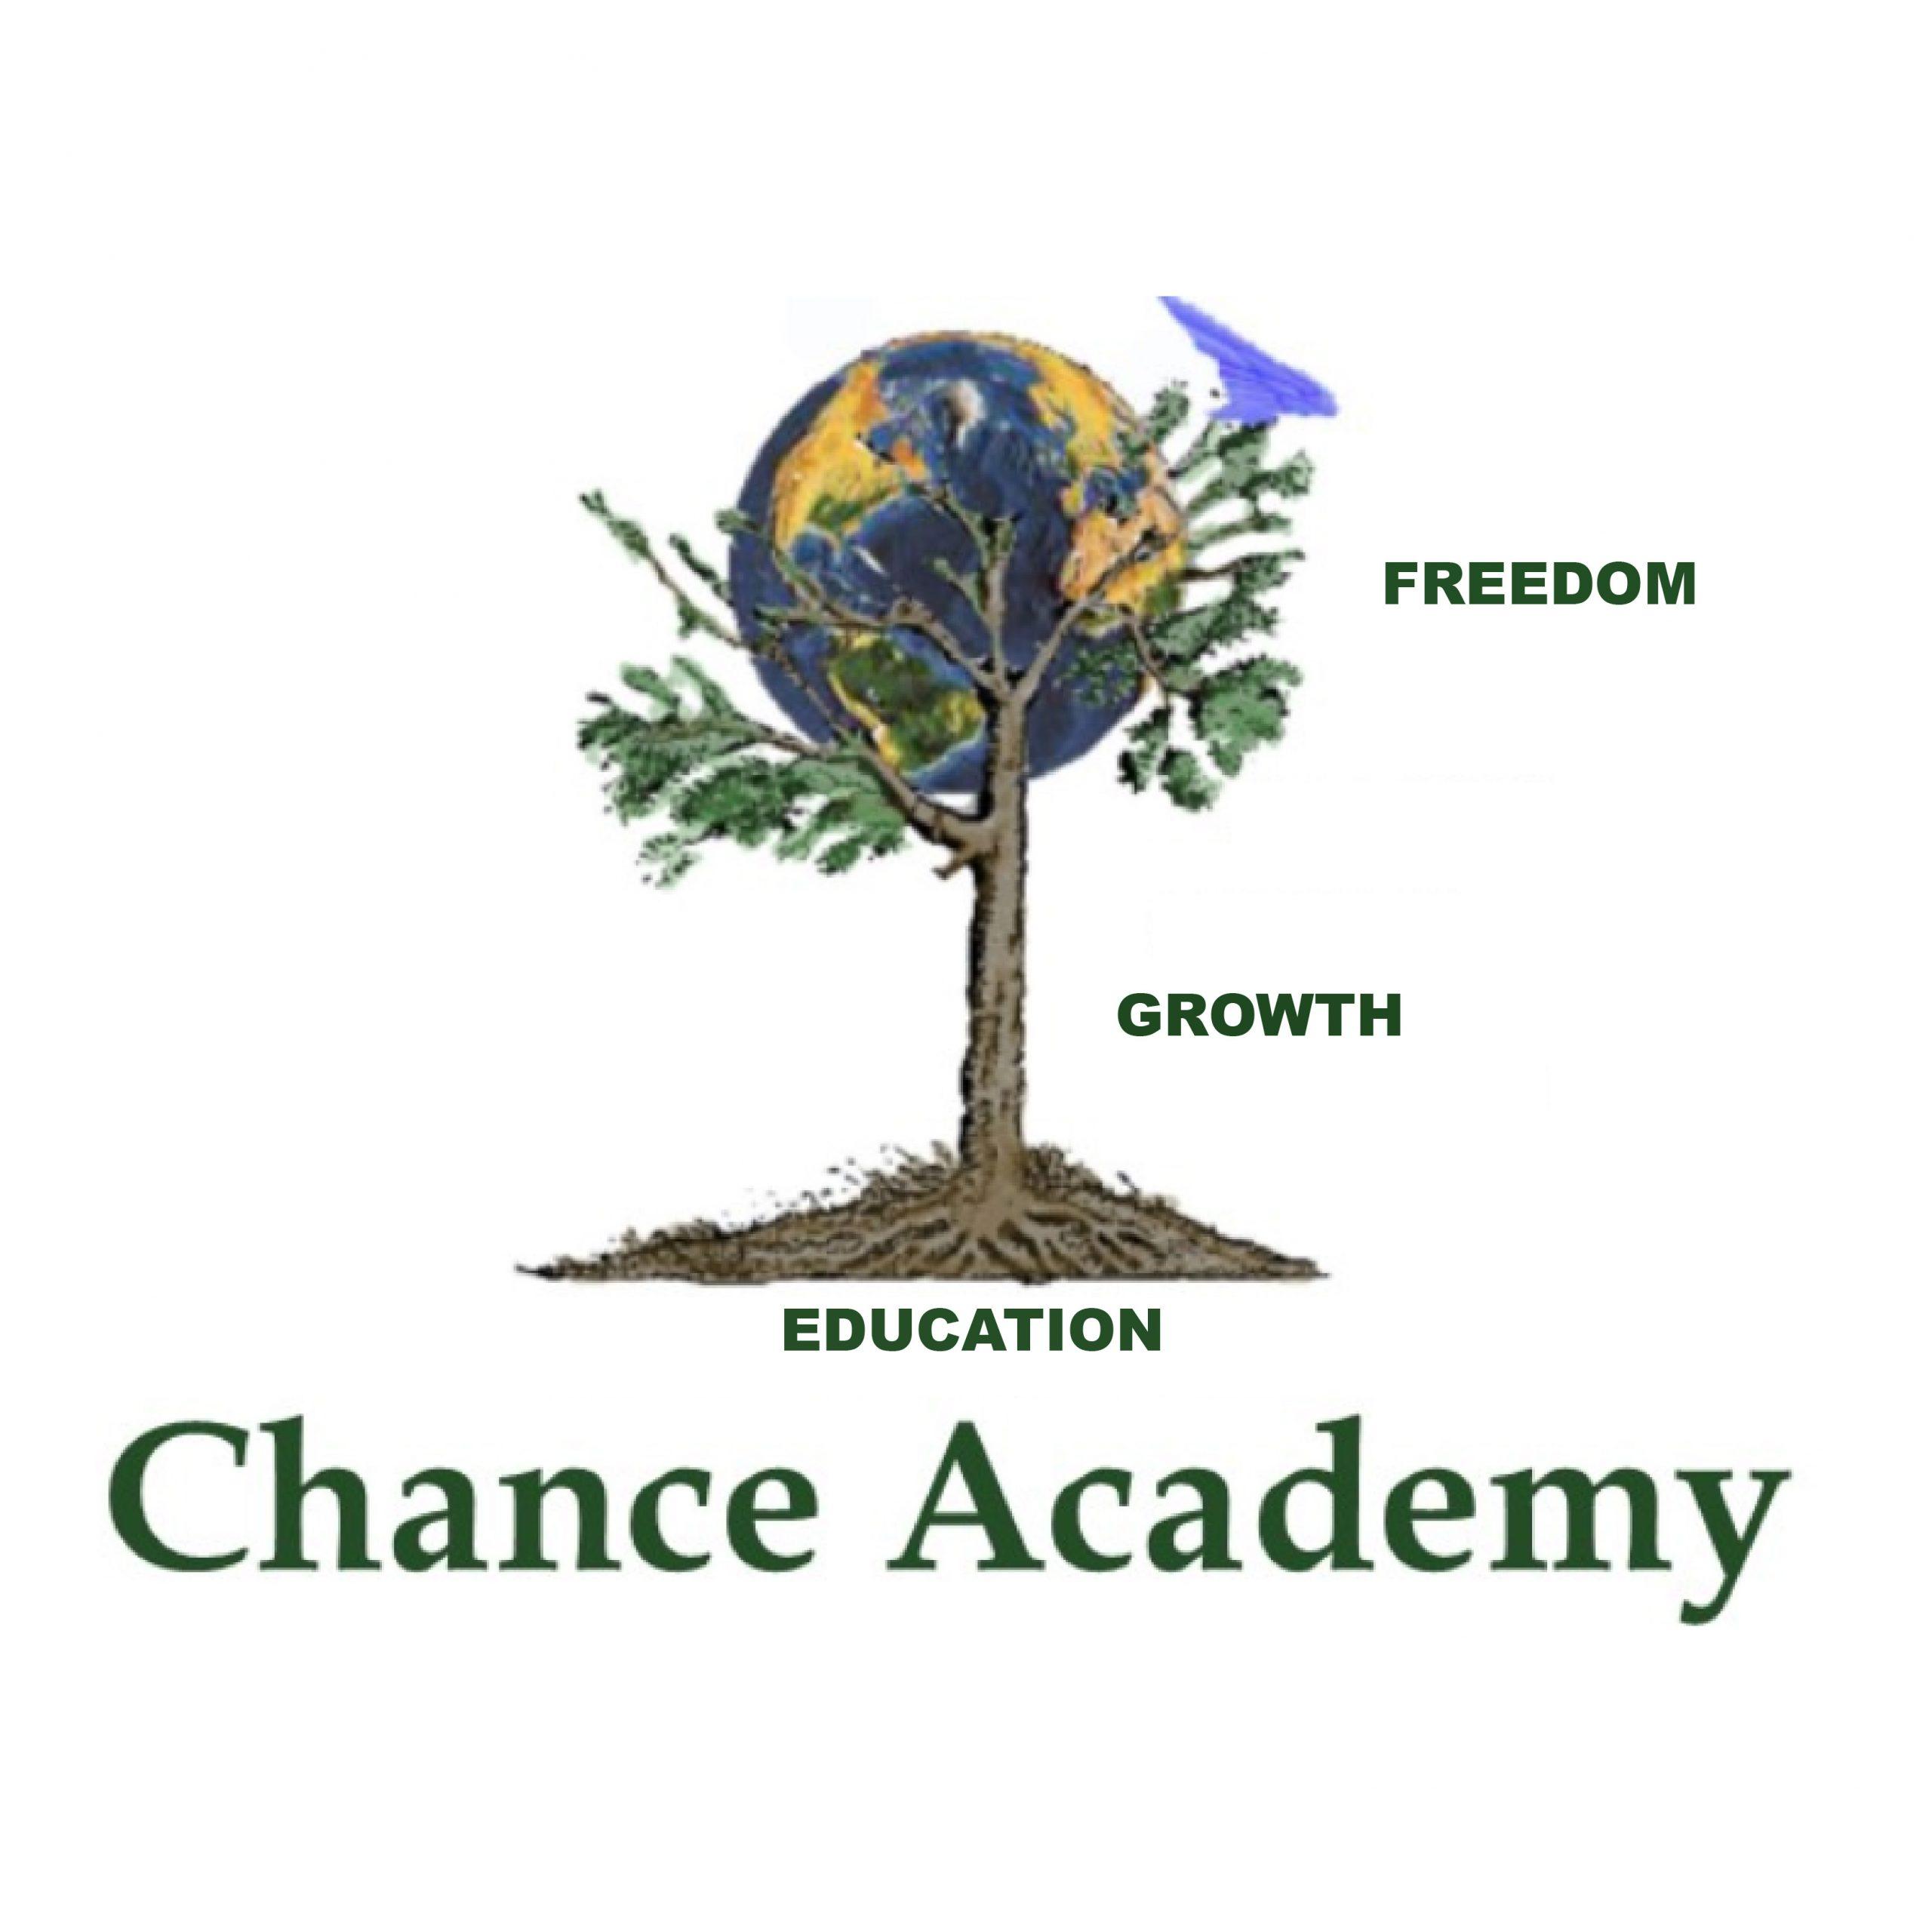 Chance Academy